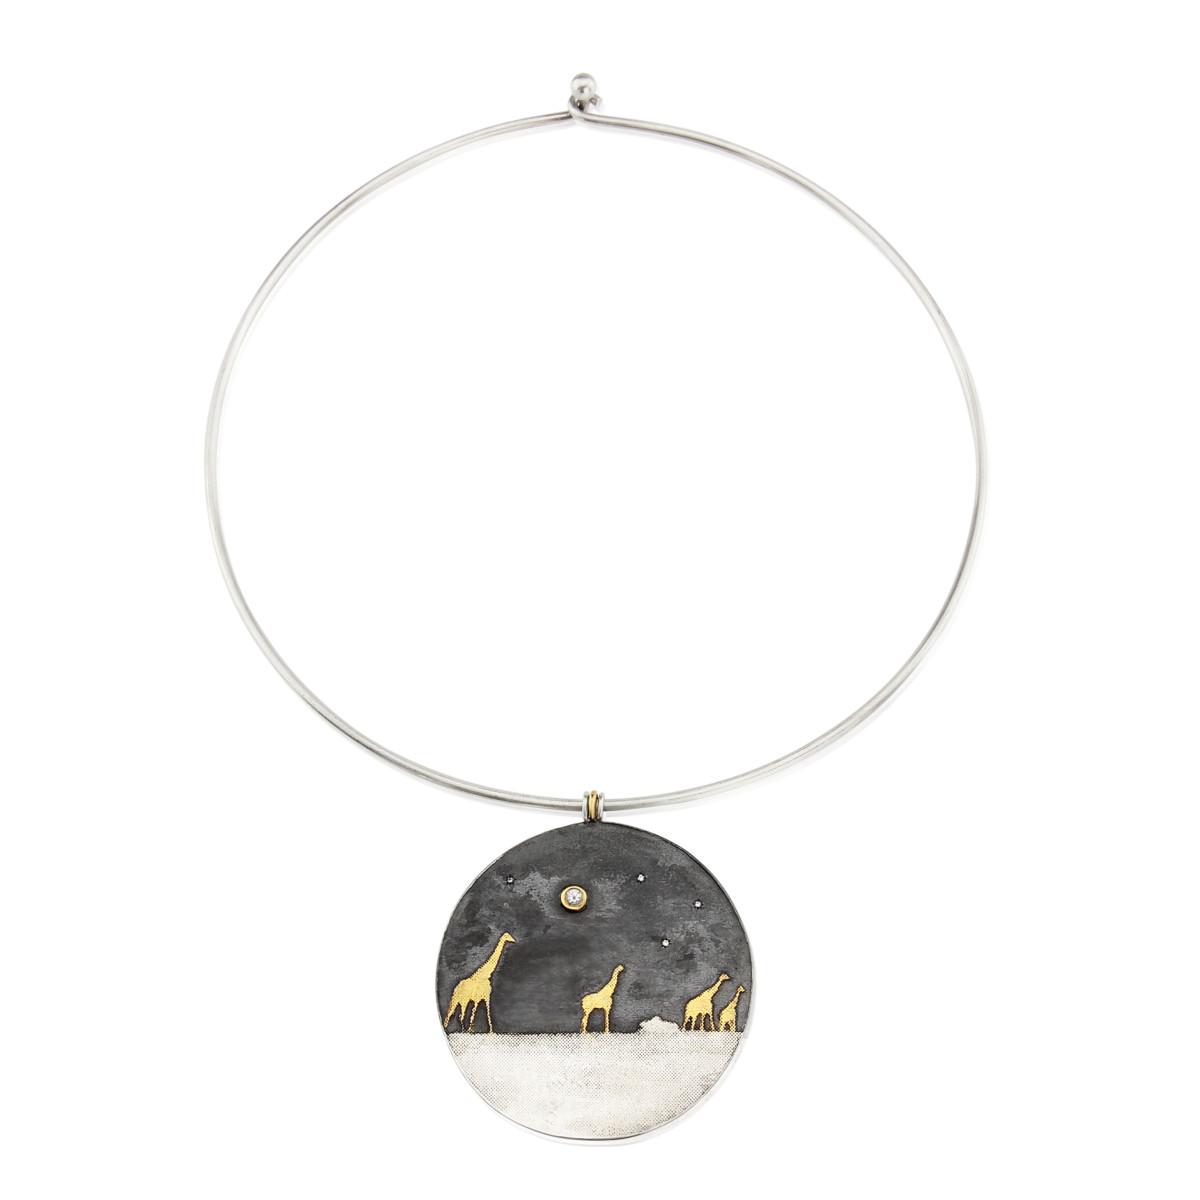 - Charlotte Lowe Jewellery